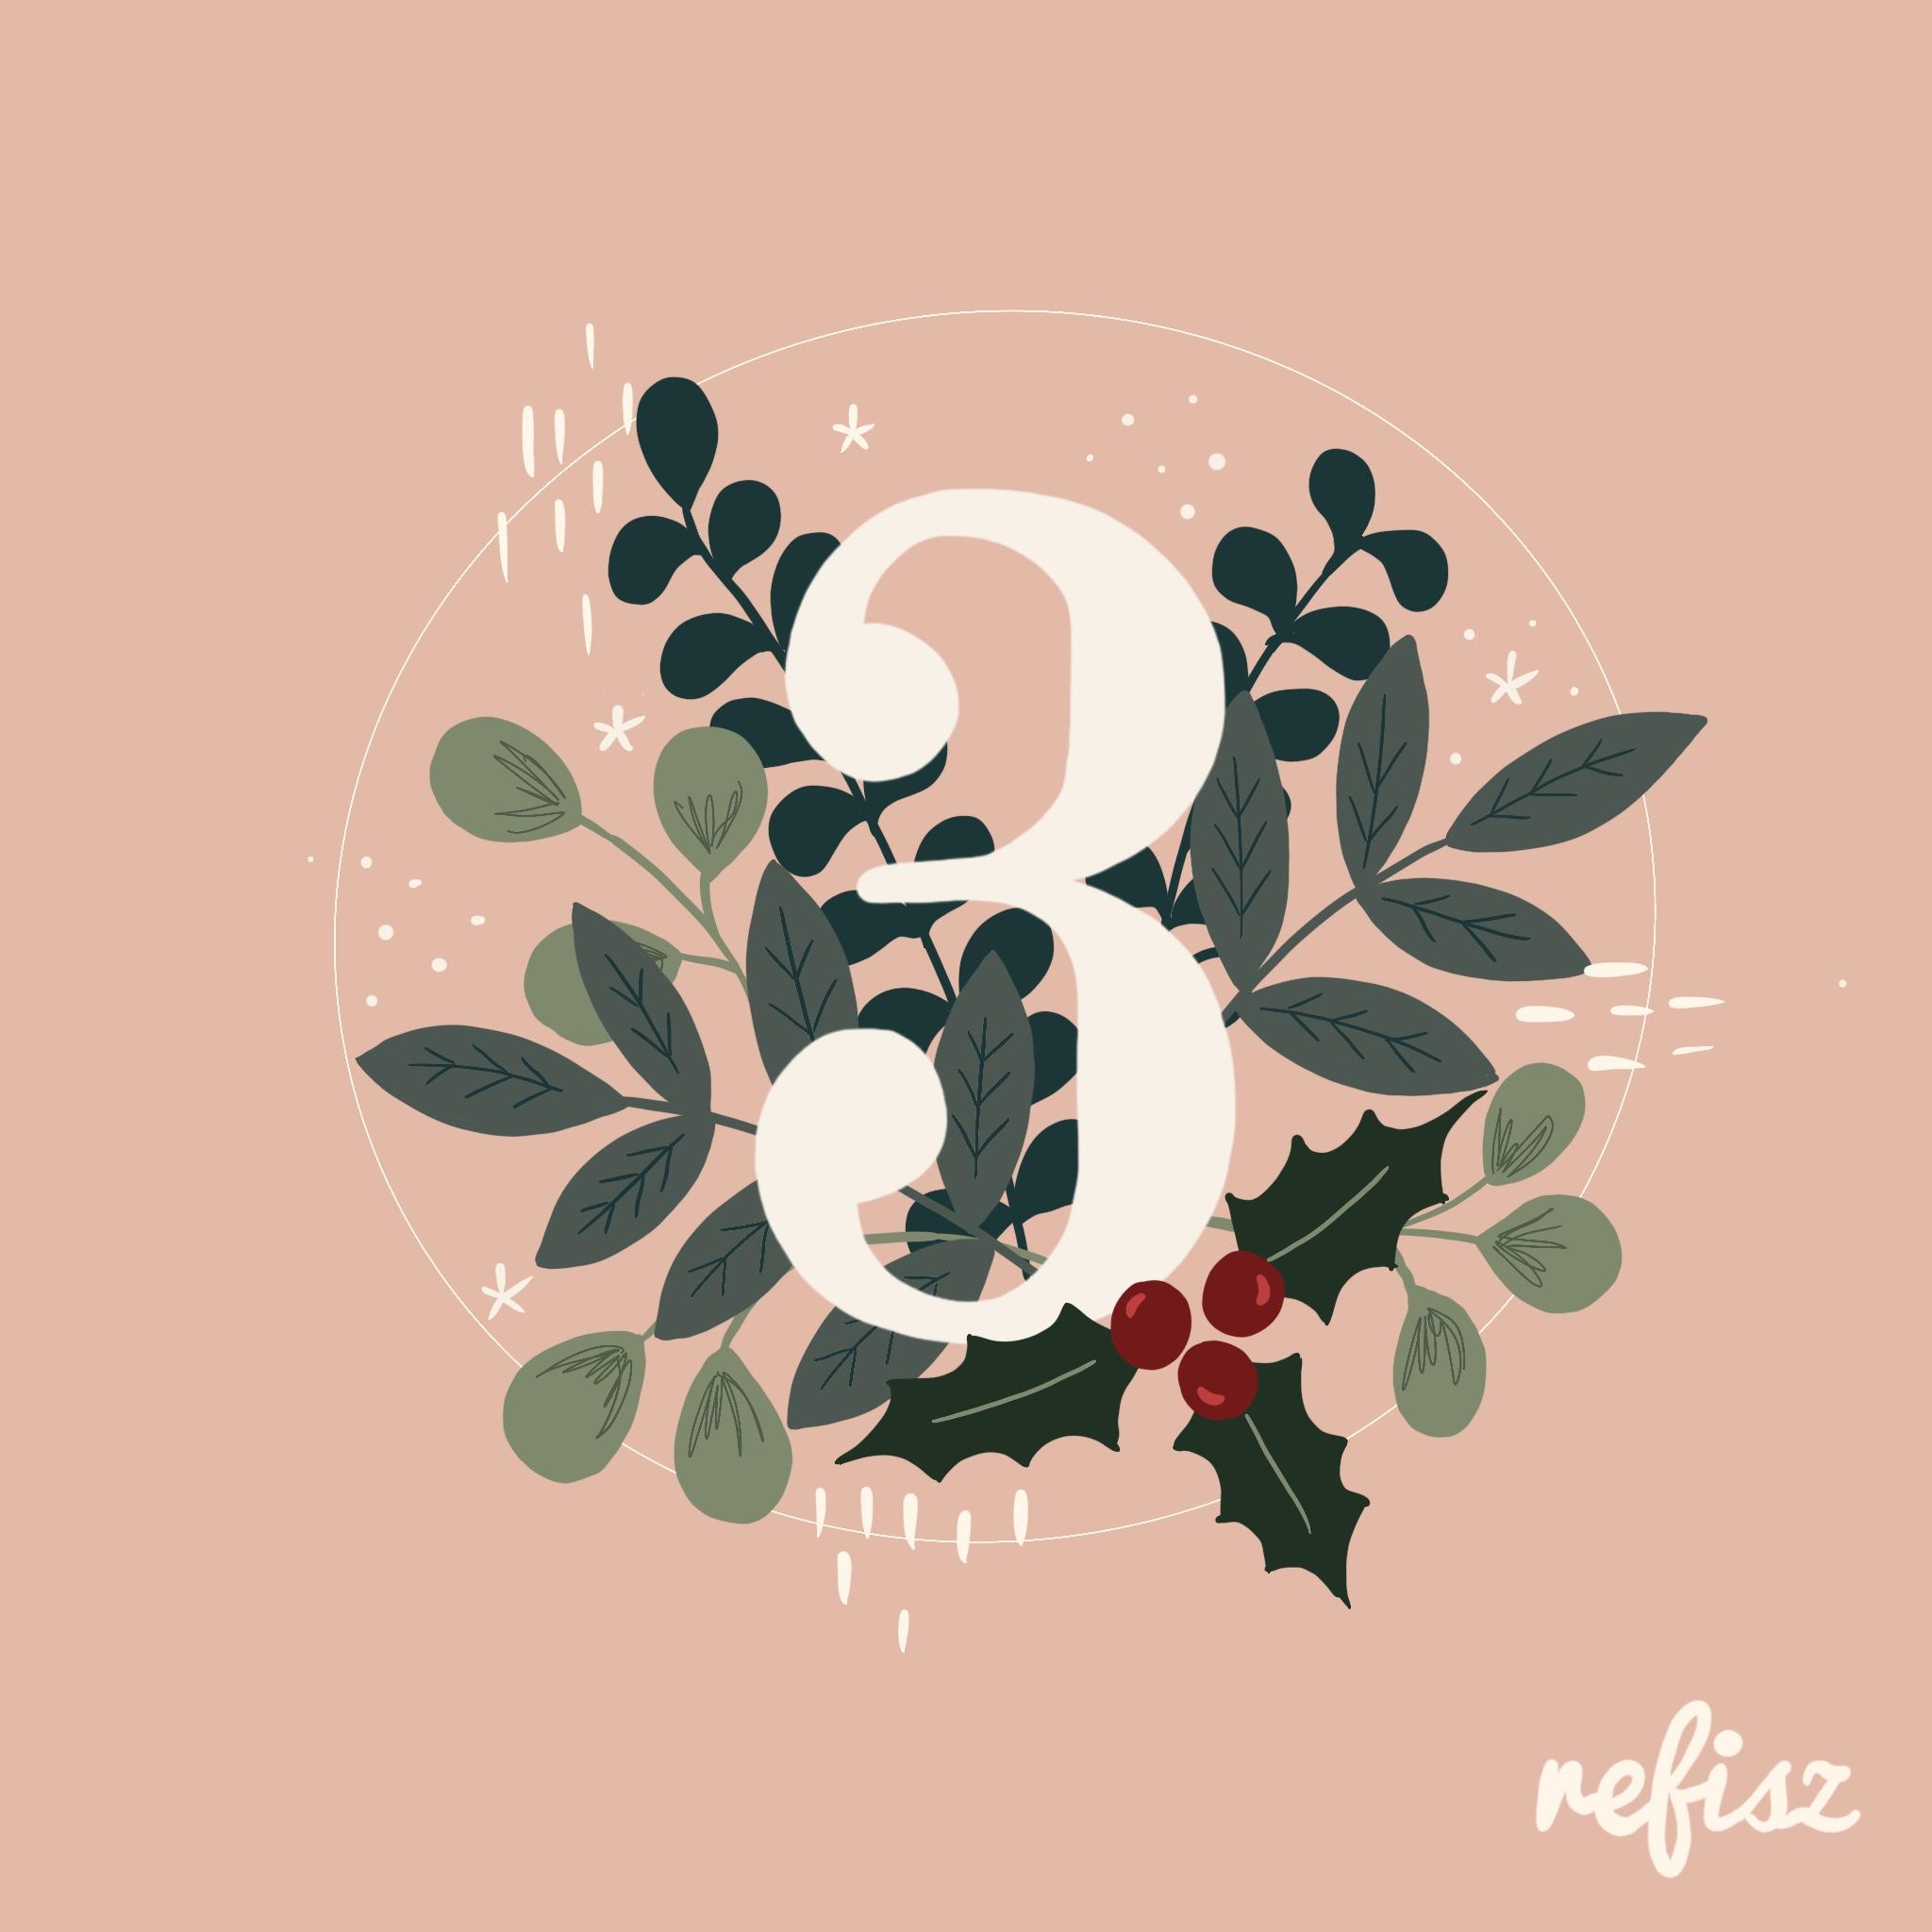 REFISZ Adventi Kalendárium 2020. december 3.